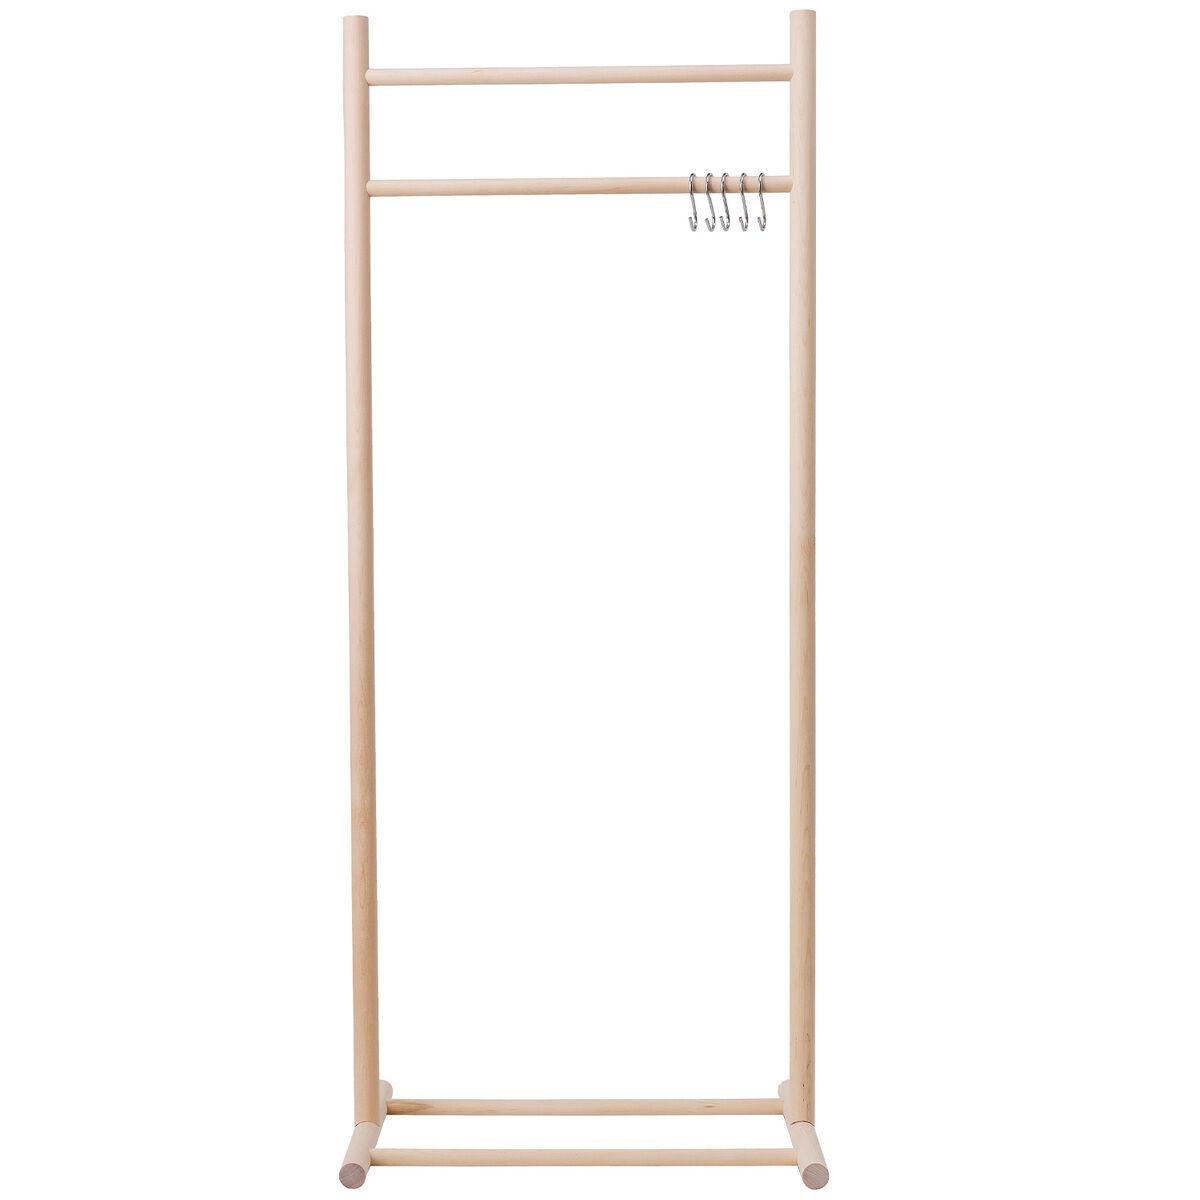 Verso Design Tikas clothes rack, S, birch